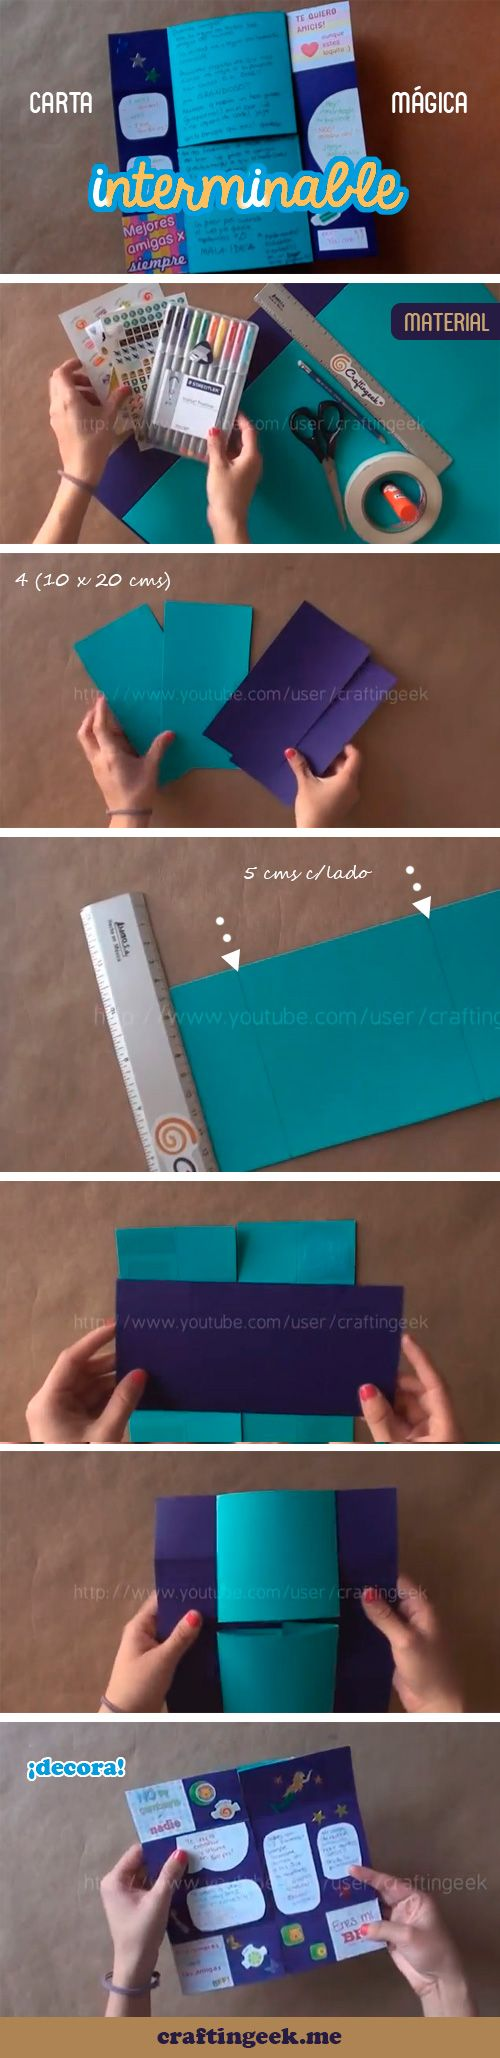 Carta Mágica interminable CG* ♥ Una idea diferente para dar. http://www.youtube.com/watch?v=XM3x8CGCuCE